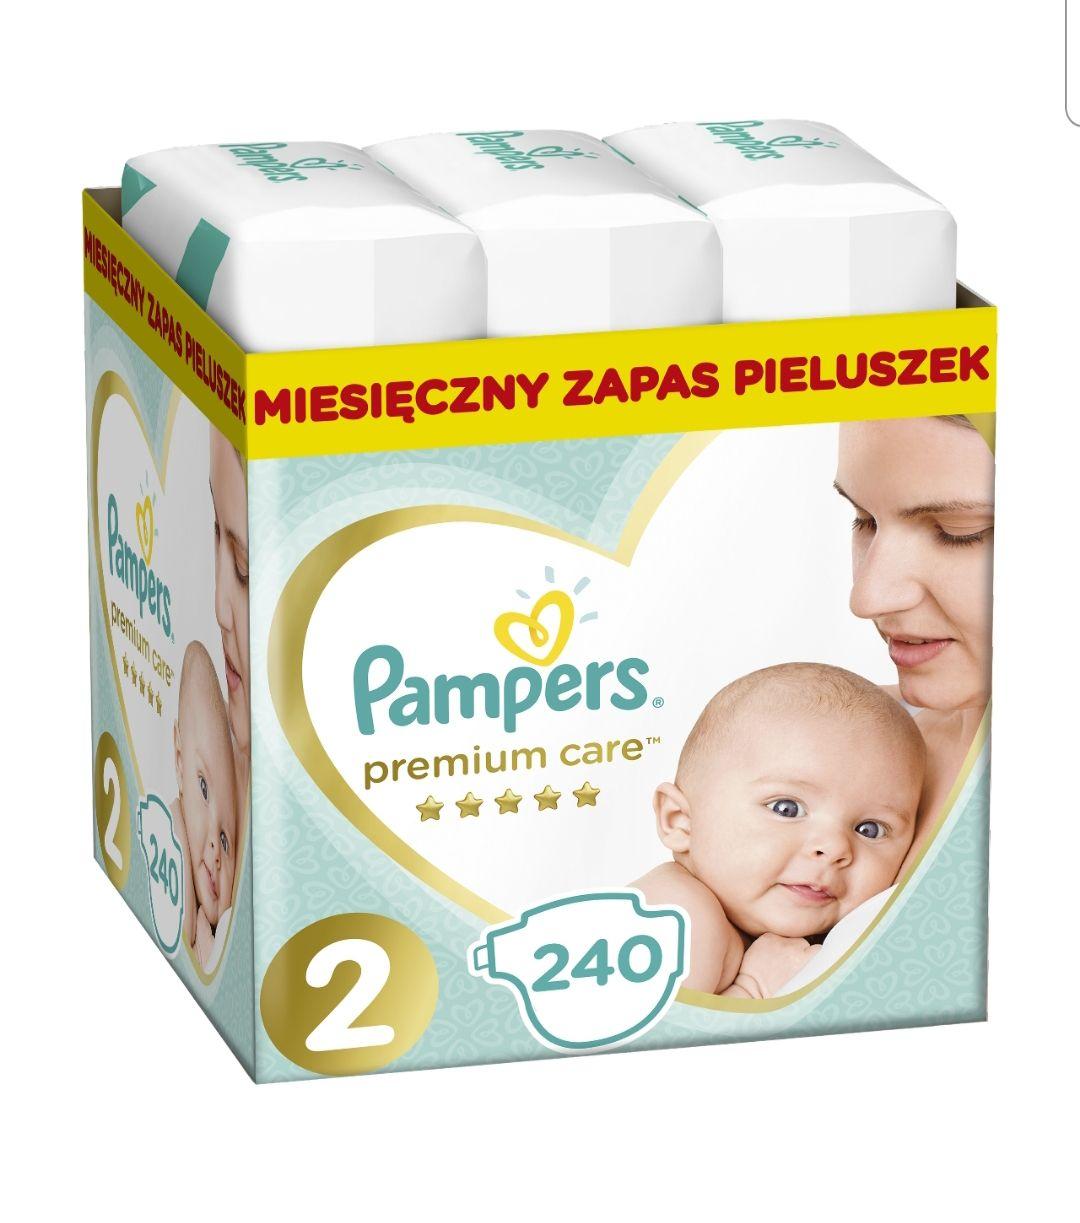 [Allegro smart] PAMPERS Pieluchy PREMIUM CARE 2 Mini 240 sztuk + 8 monet